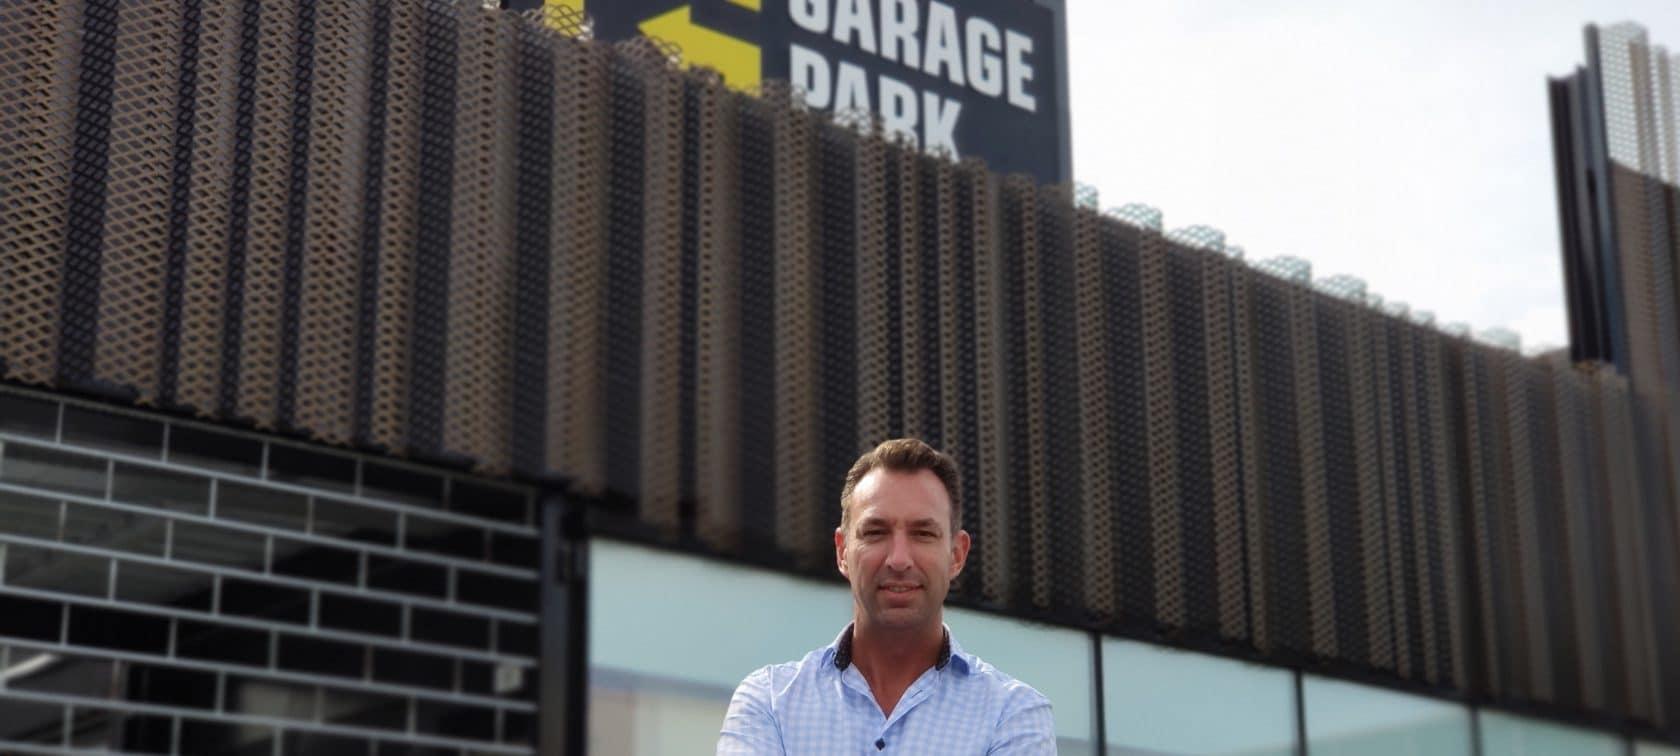 Frank Rohlhof - GaragePark